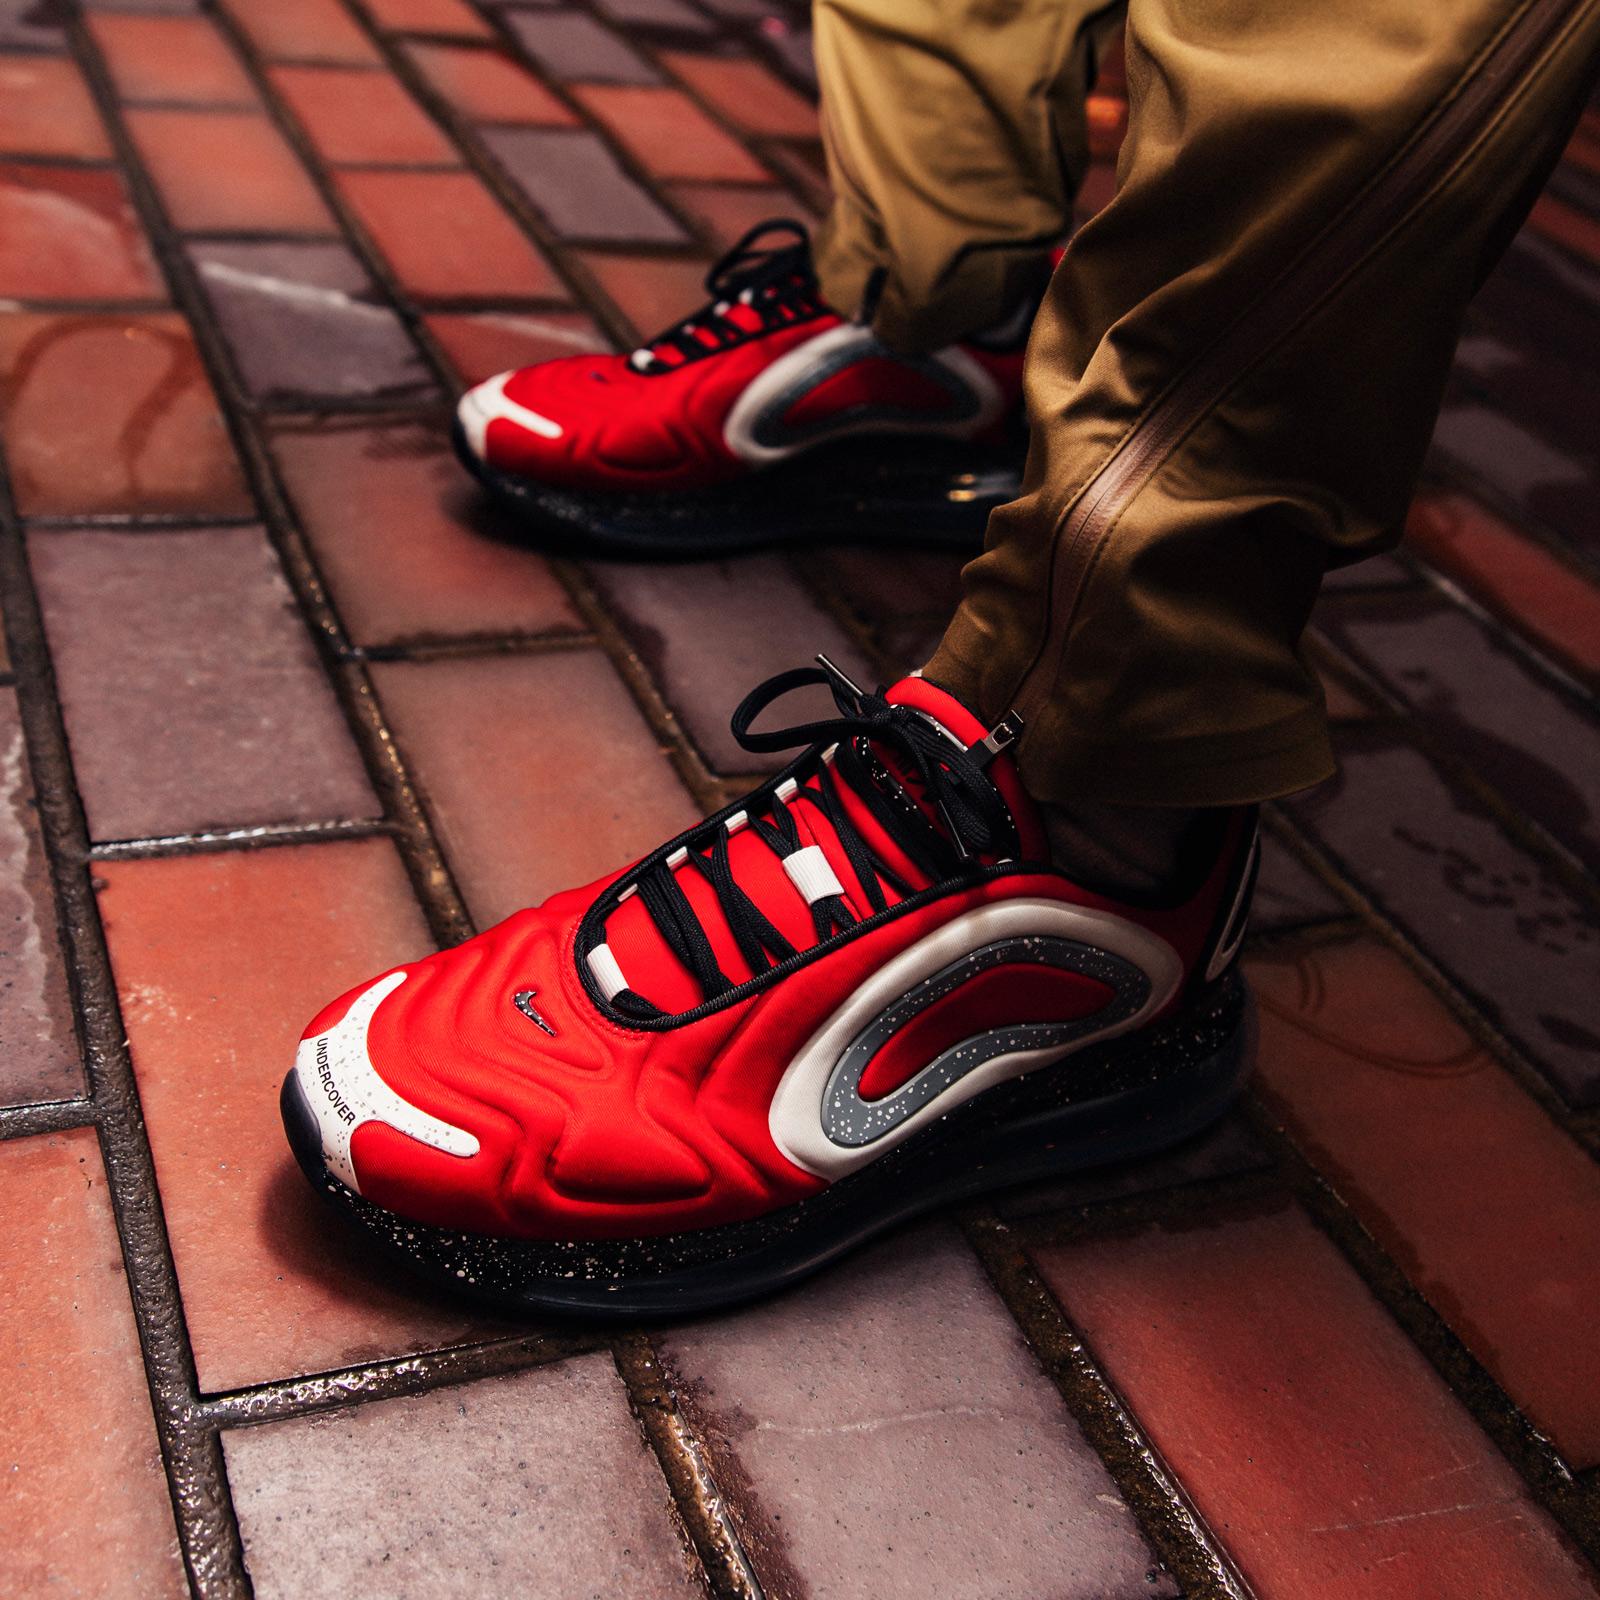 Nike Air Max 720 Undercover Cn2408 600 Sneakersnstuff